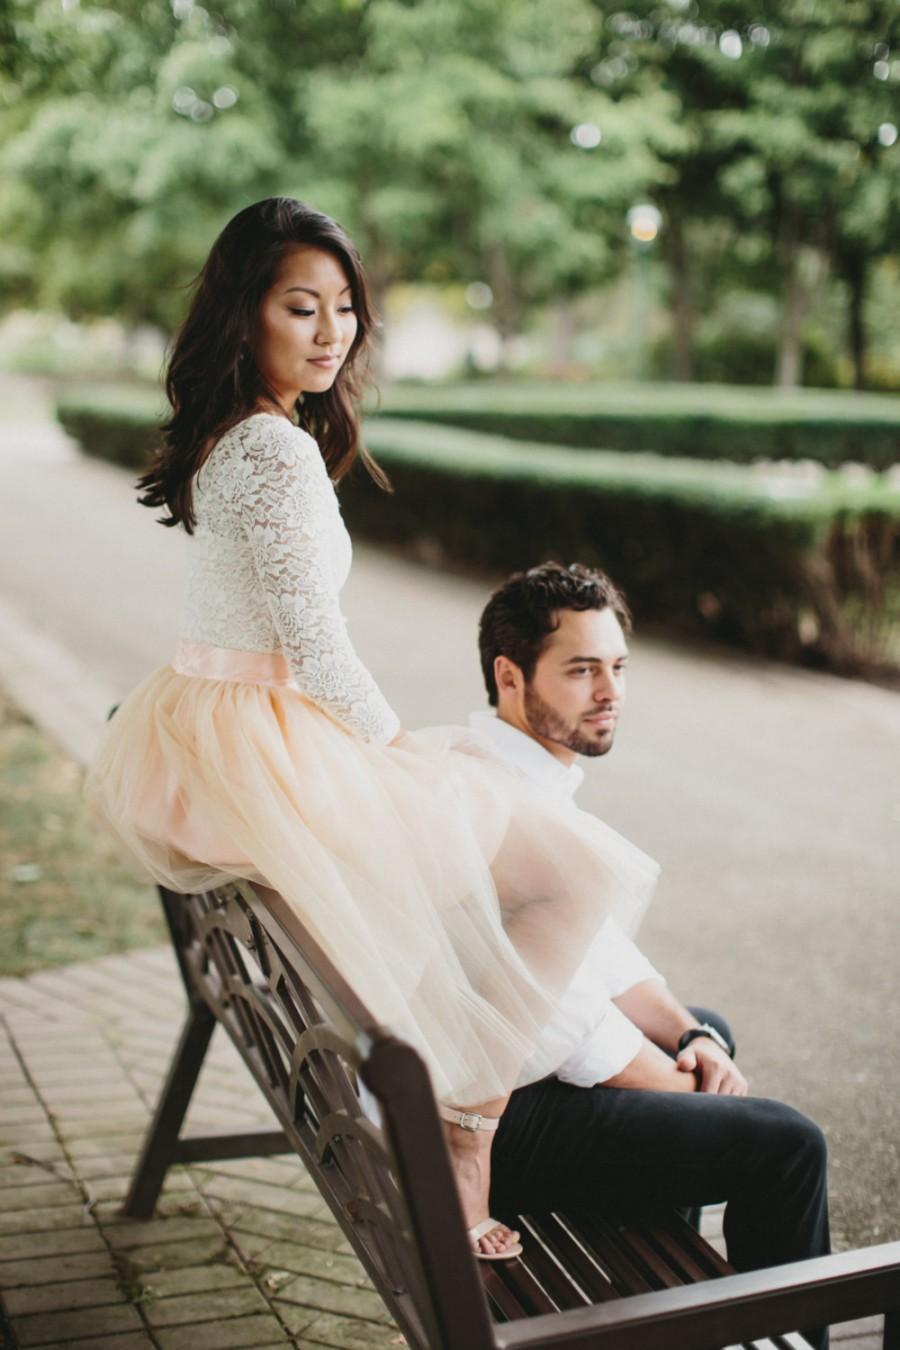 زفاف - Blush Tutu Skirt - Womens Custom Skirt - Bridesmaid Dress  - Skirts by breauxsews - Wedding Party Skirt - Midi Tulle Skirt - Tulle Skirt